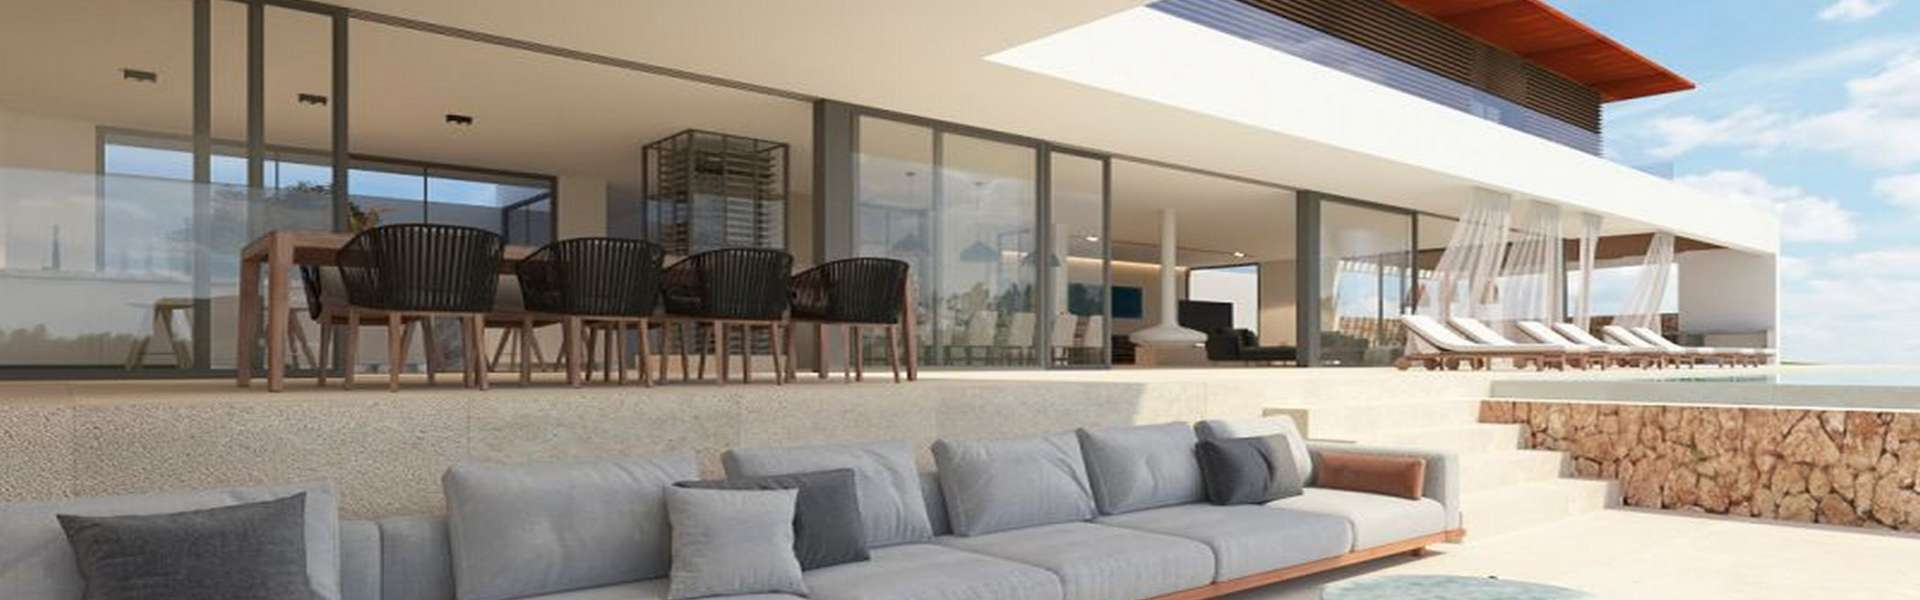 Cala Vinyes - Neubauprojekt mit Meerblick